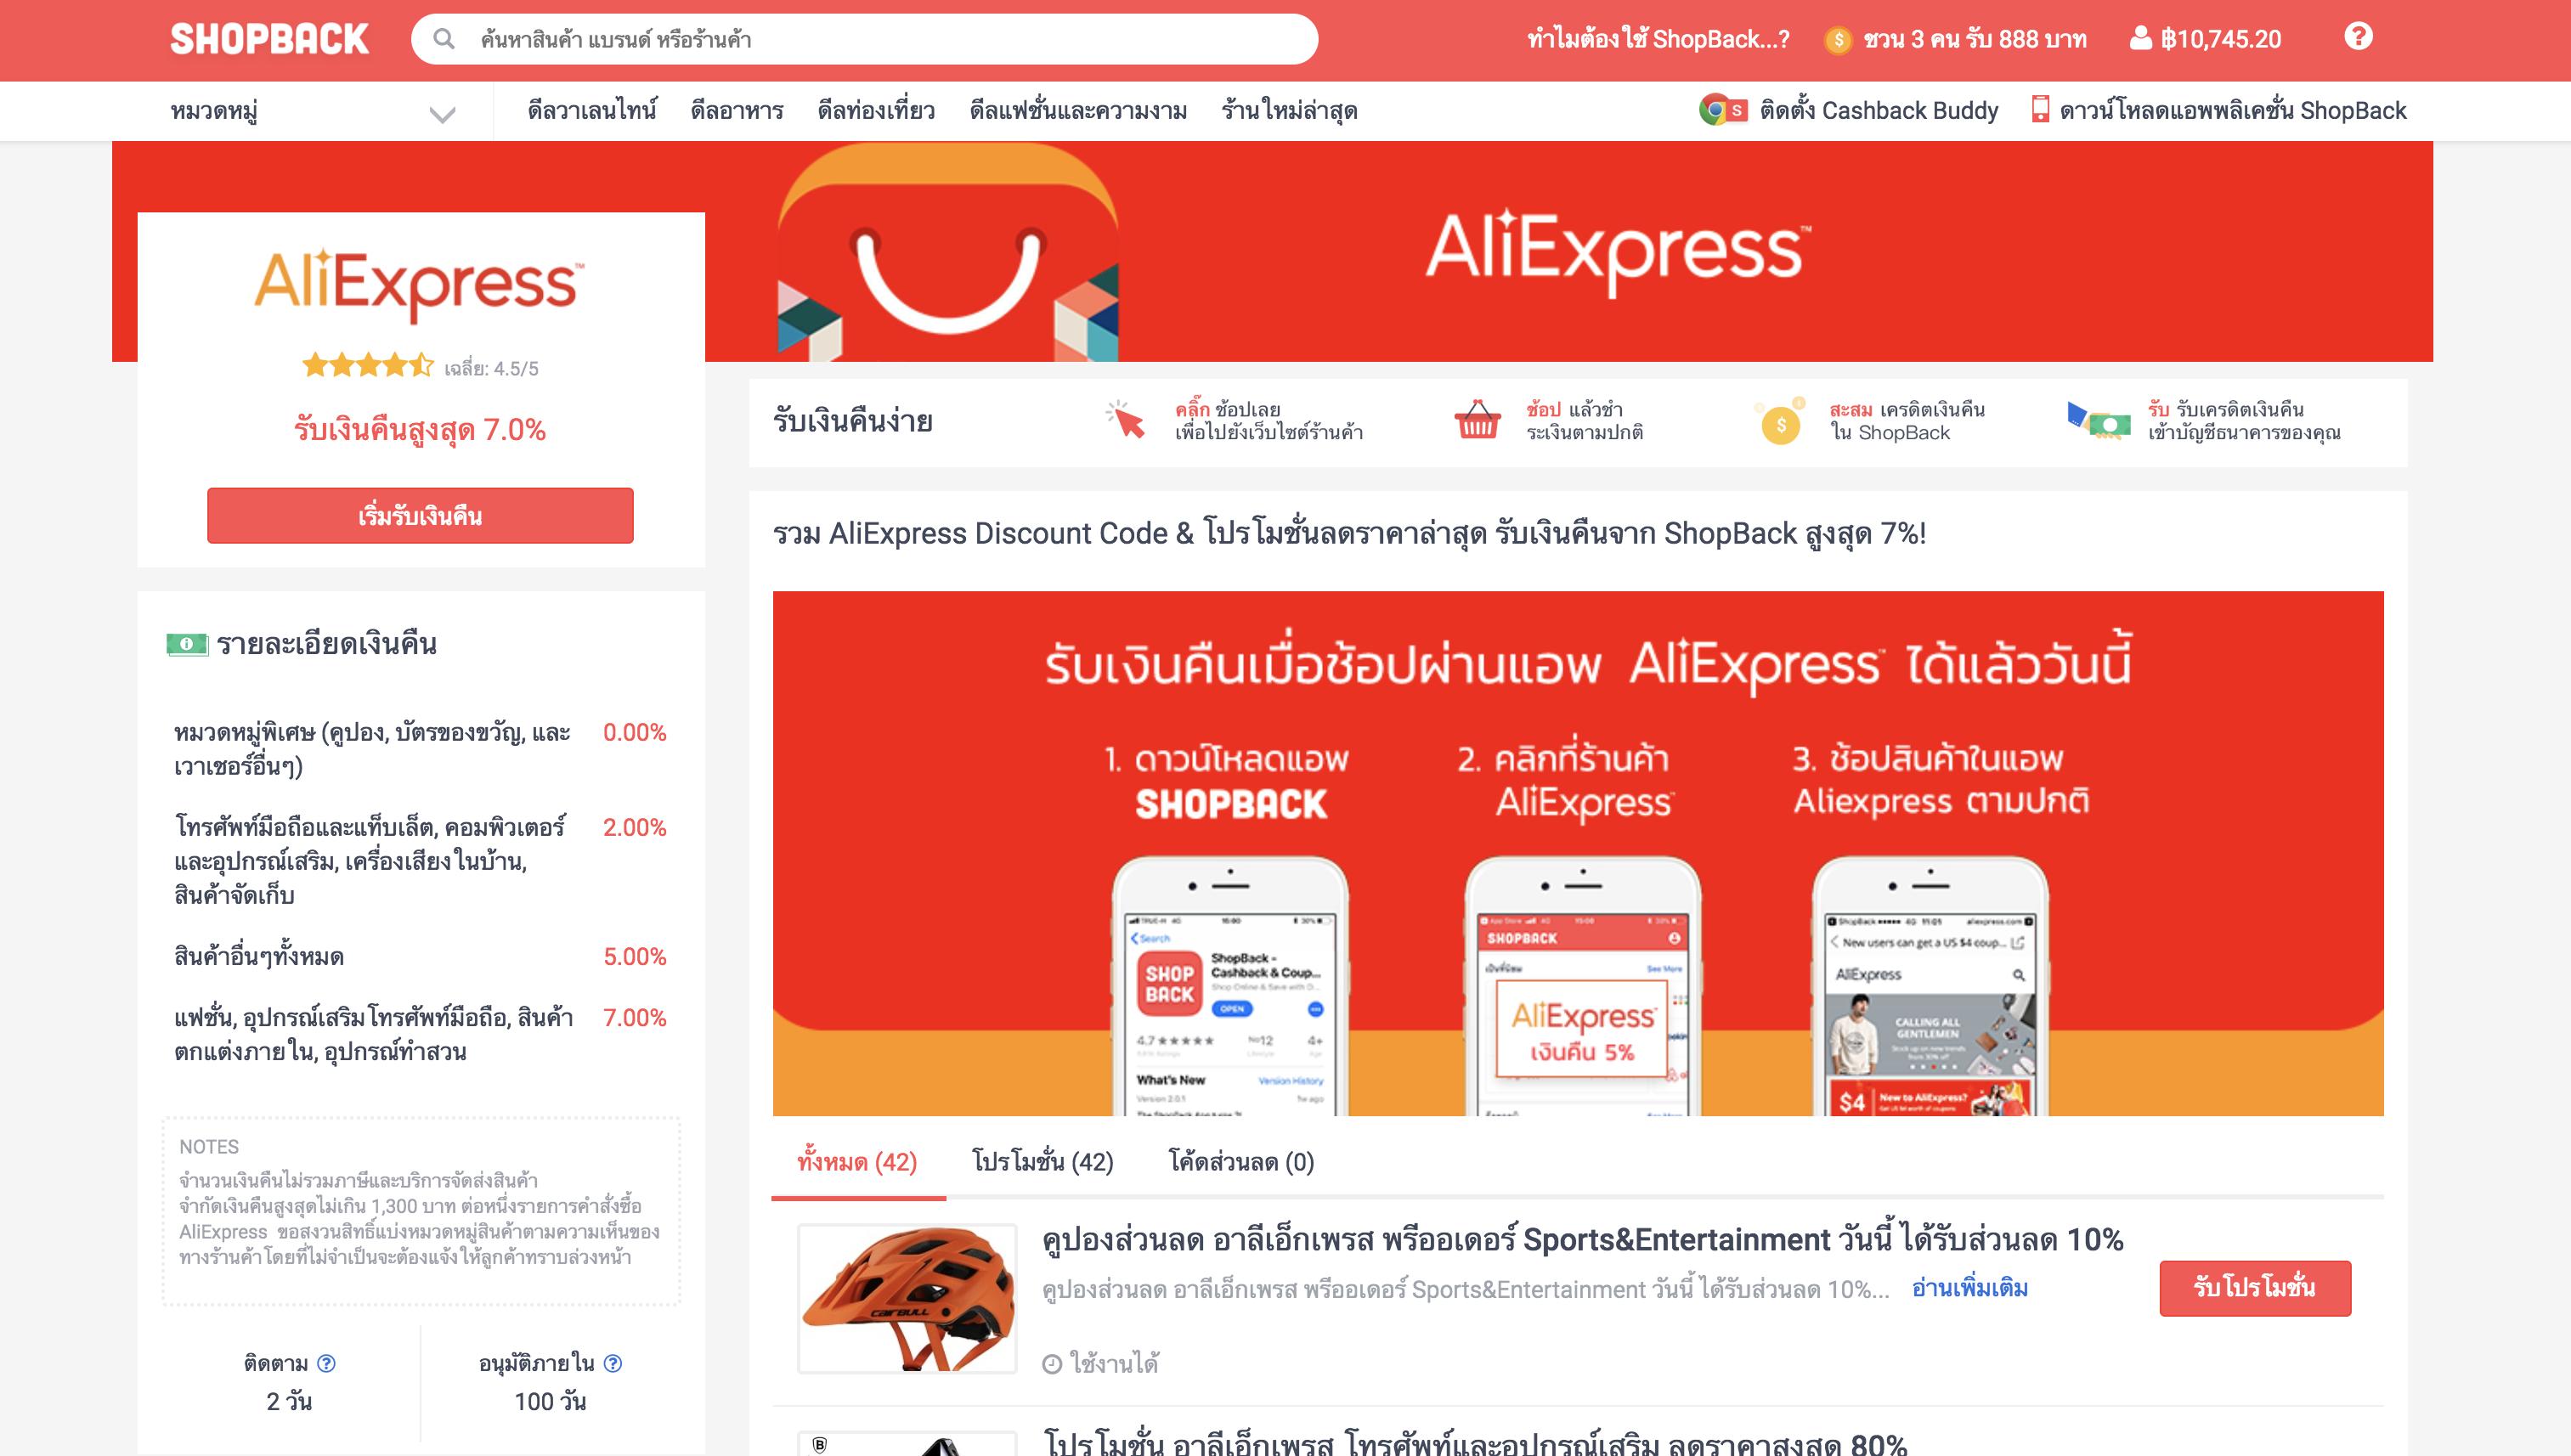 AliExpress Thai โปรโมชั่น โค้ด-คูปองส่วนลด